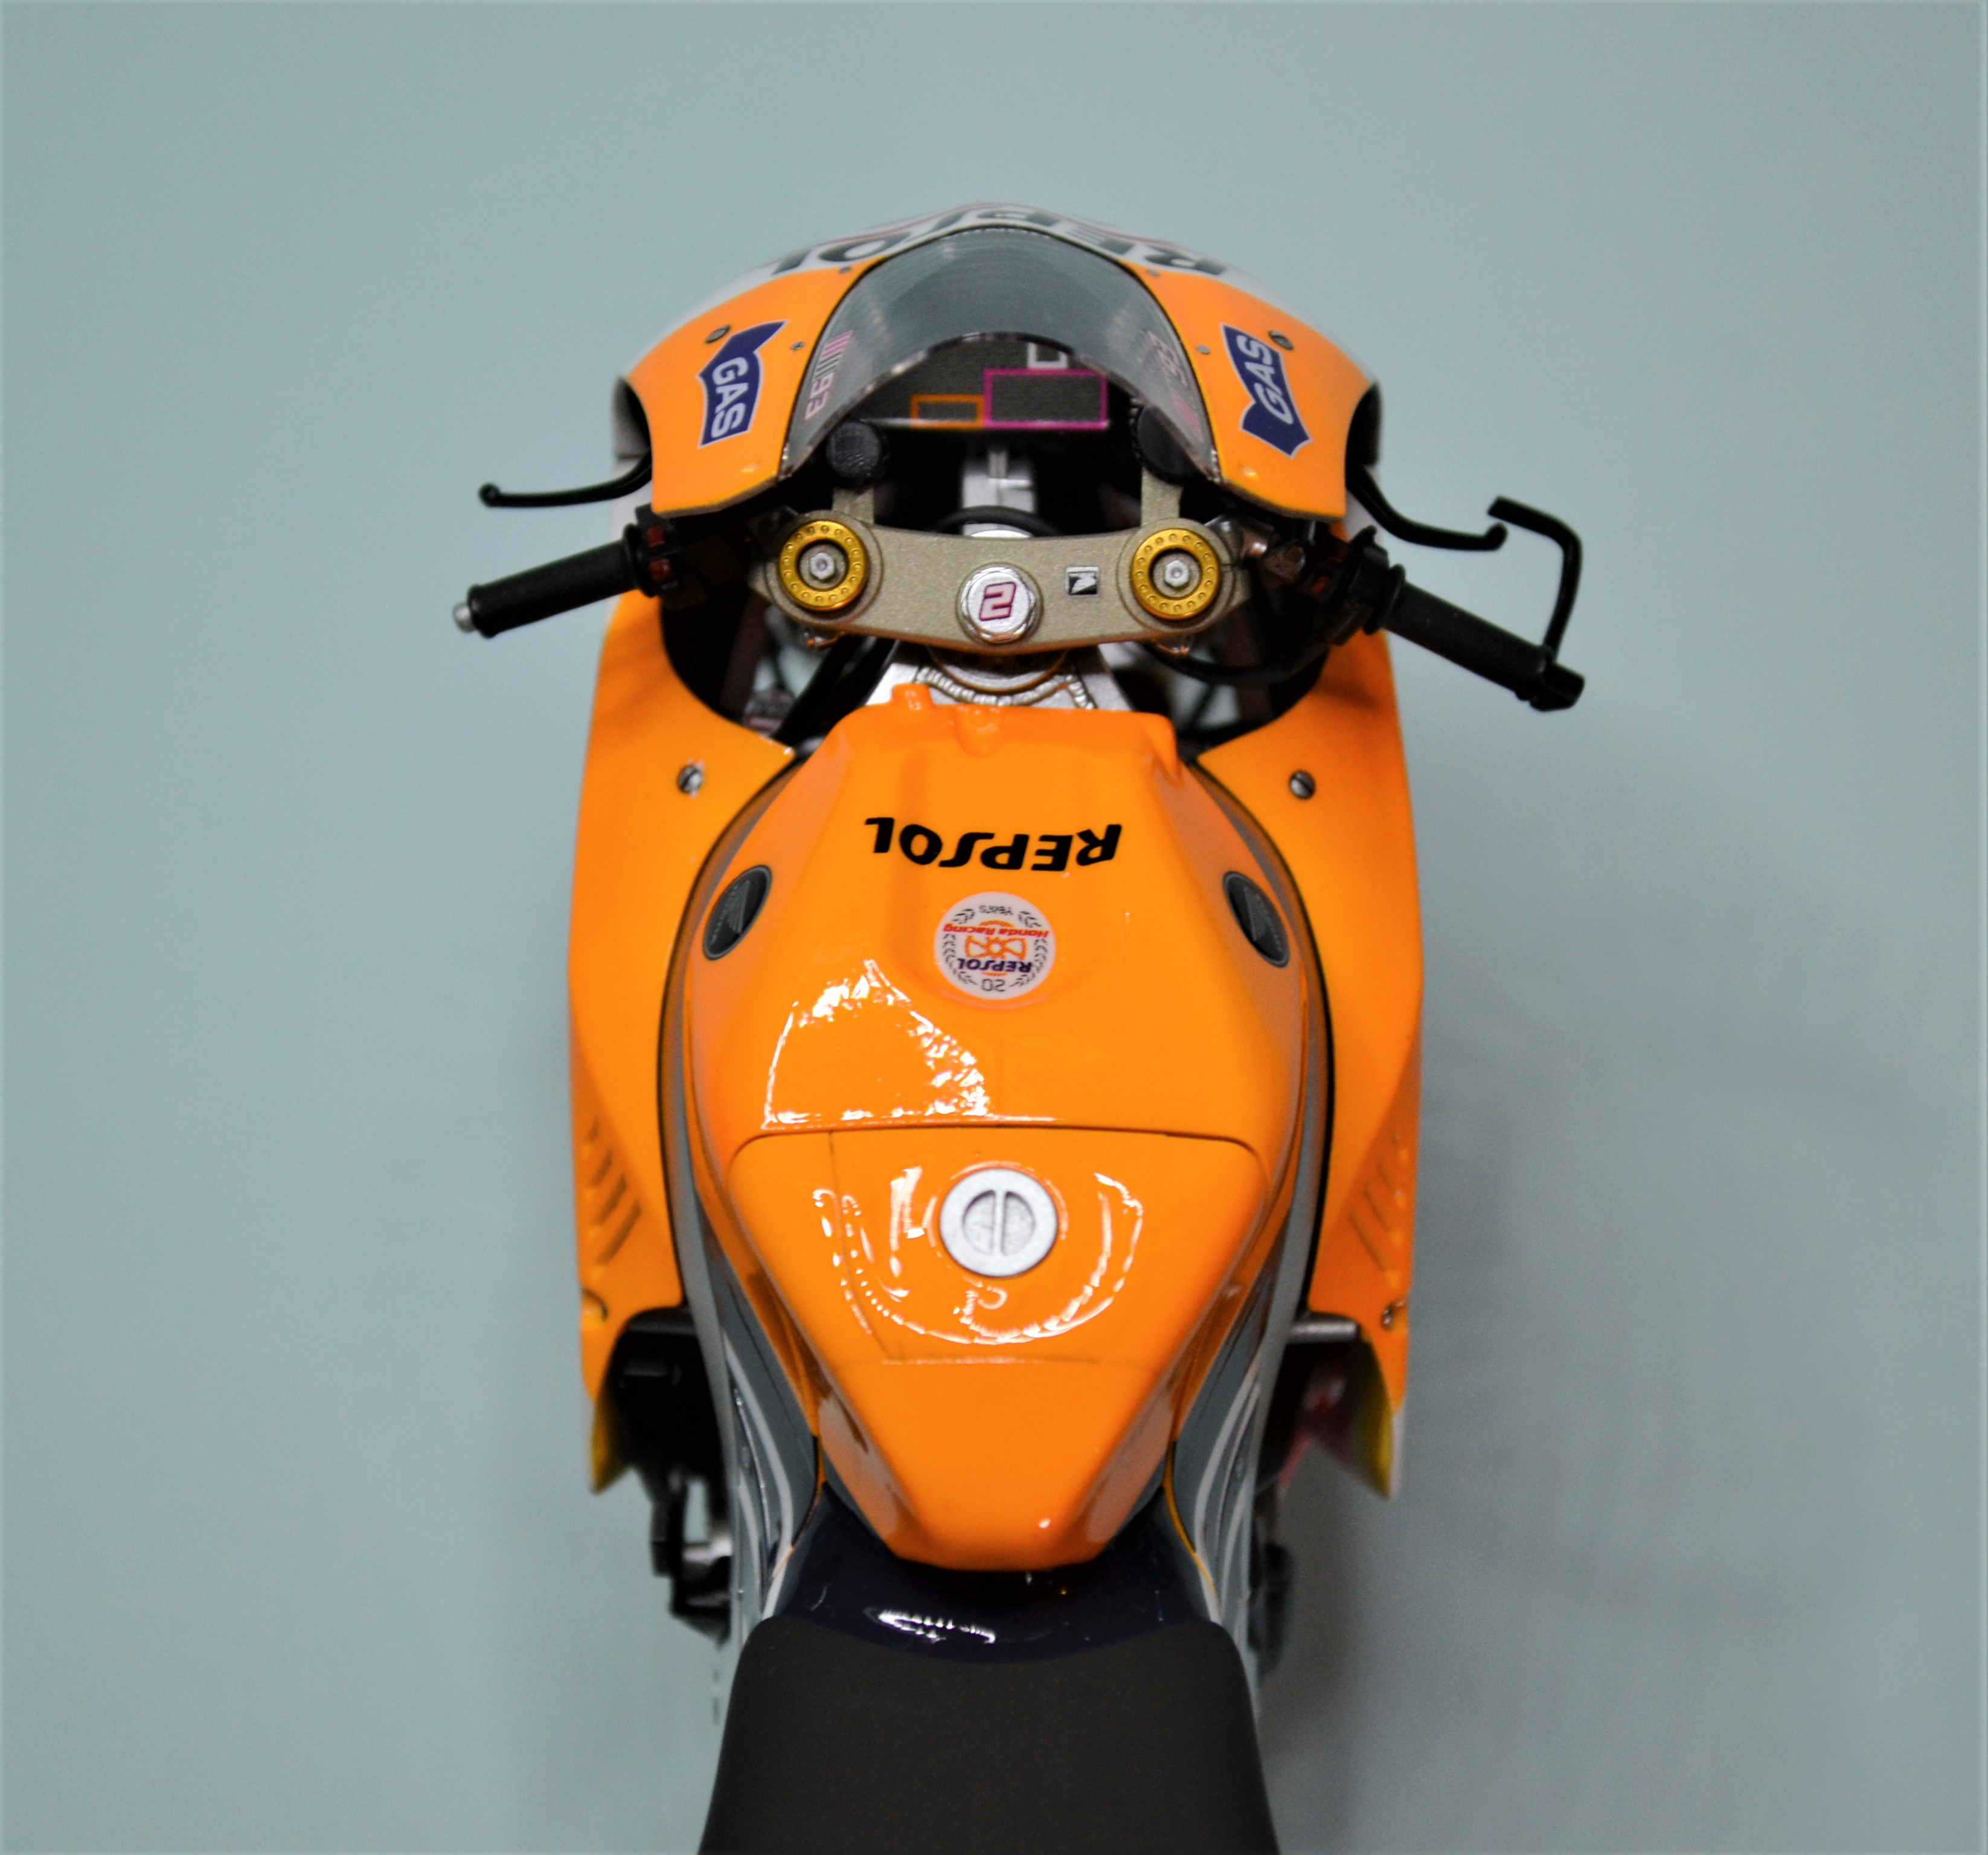 Honda Repsol Marc Marquez 1/12  - Page 2 17073112315113888